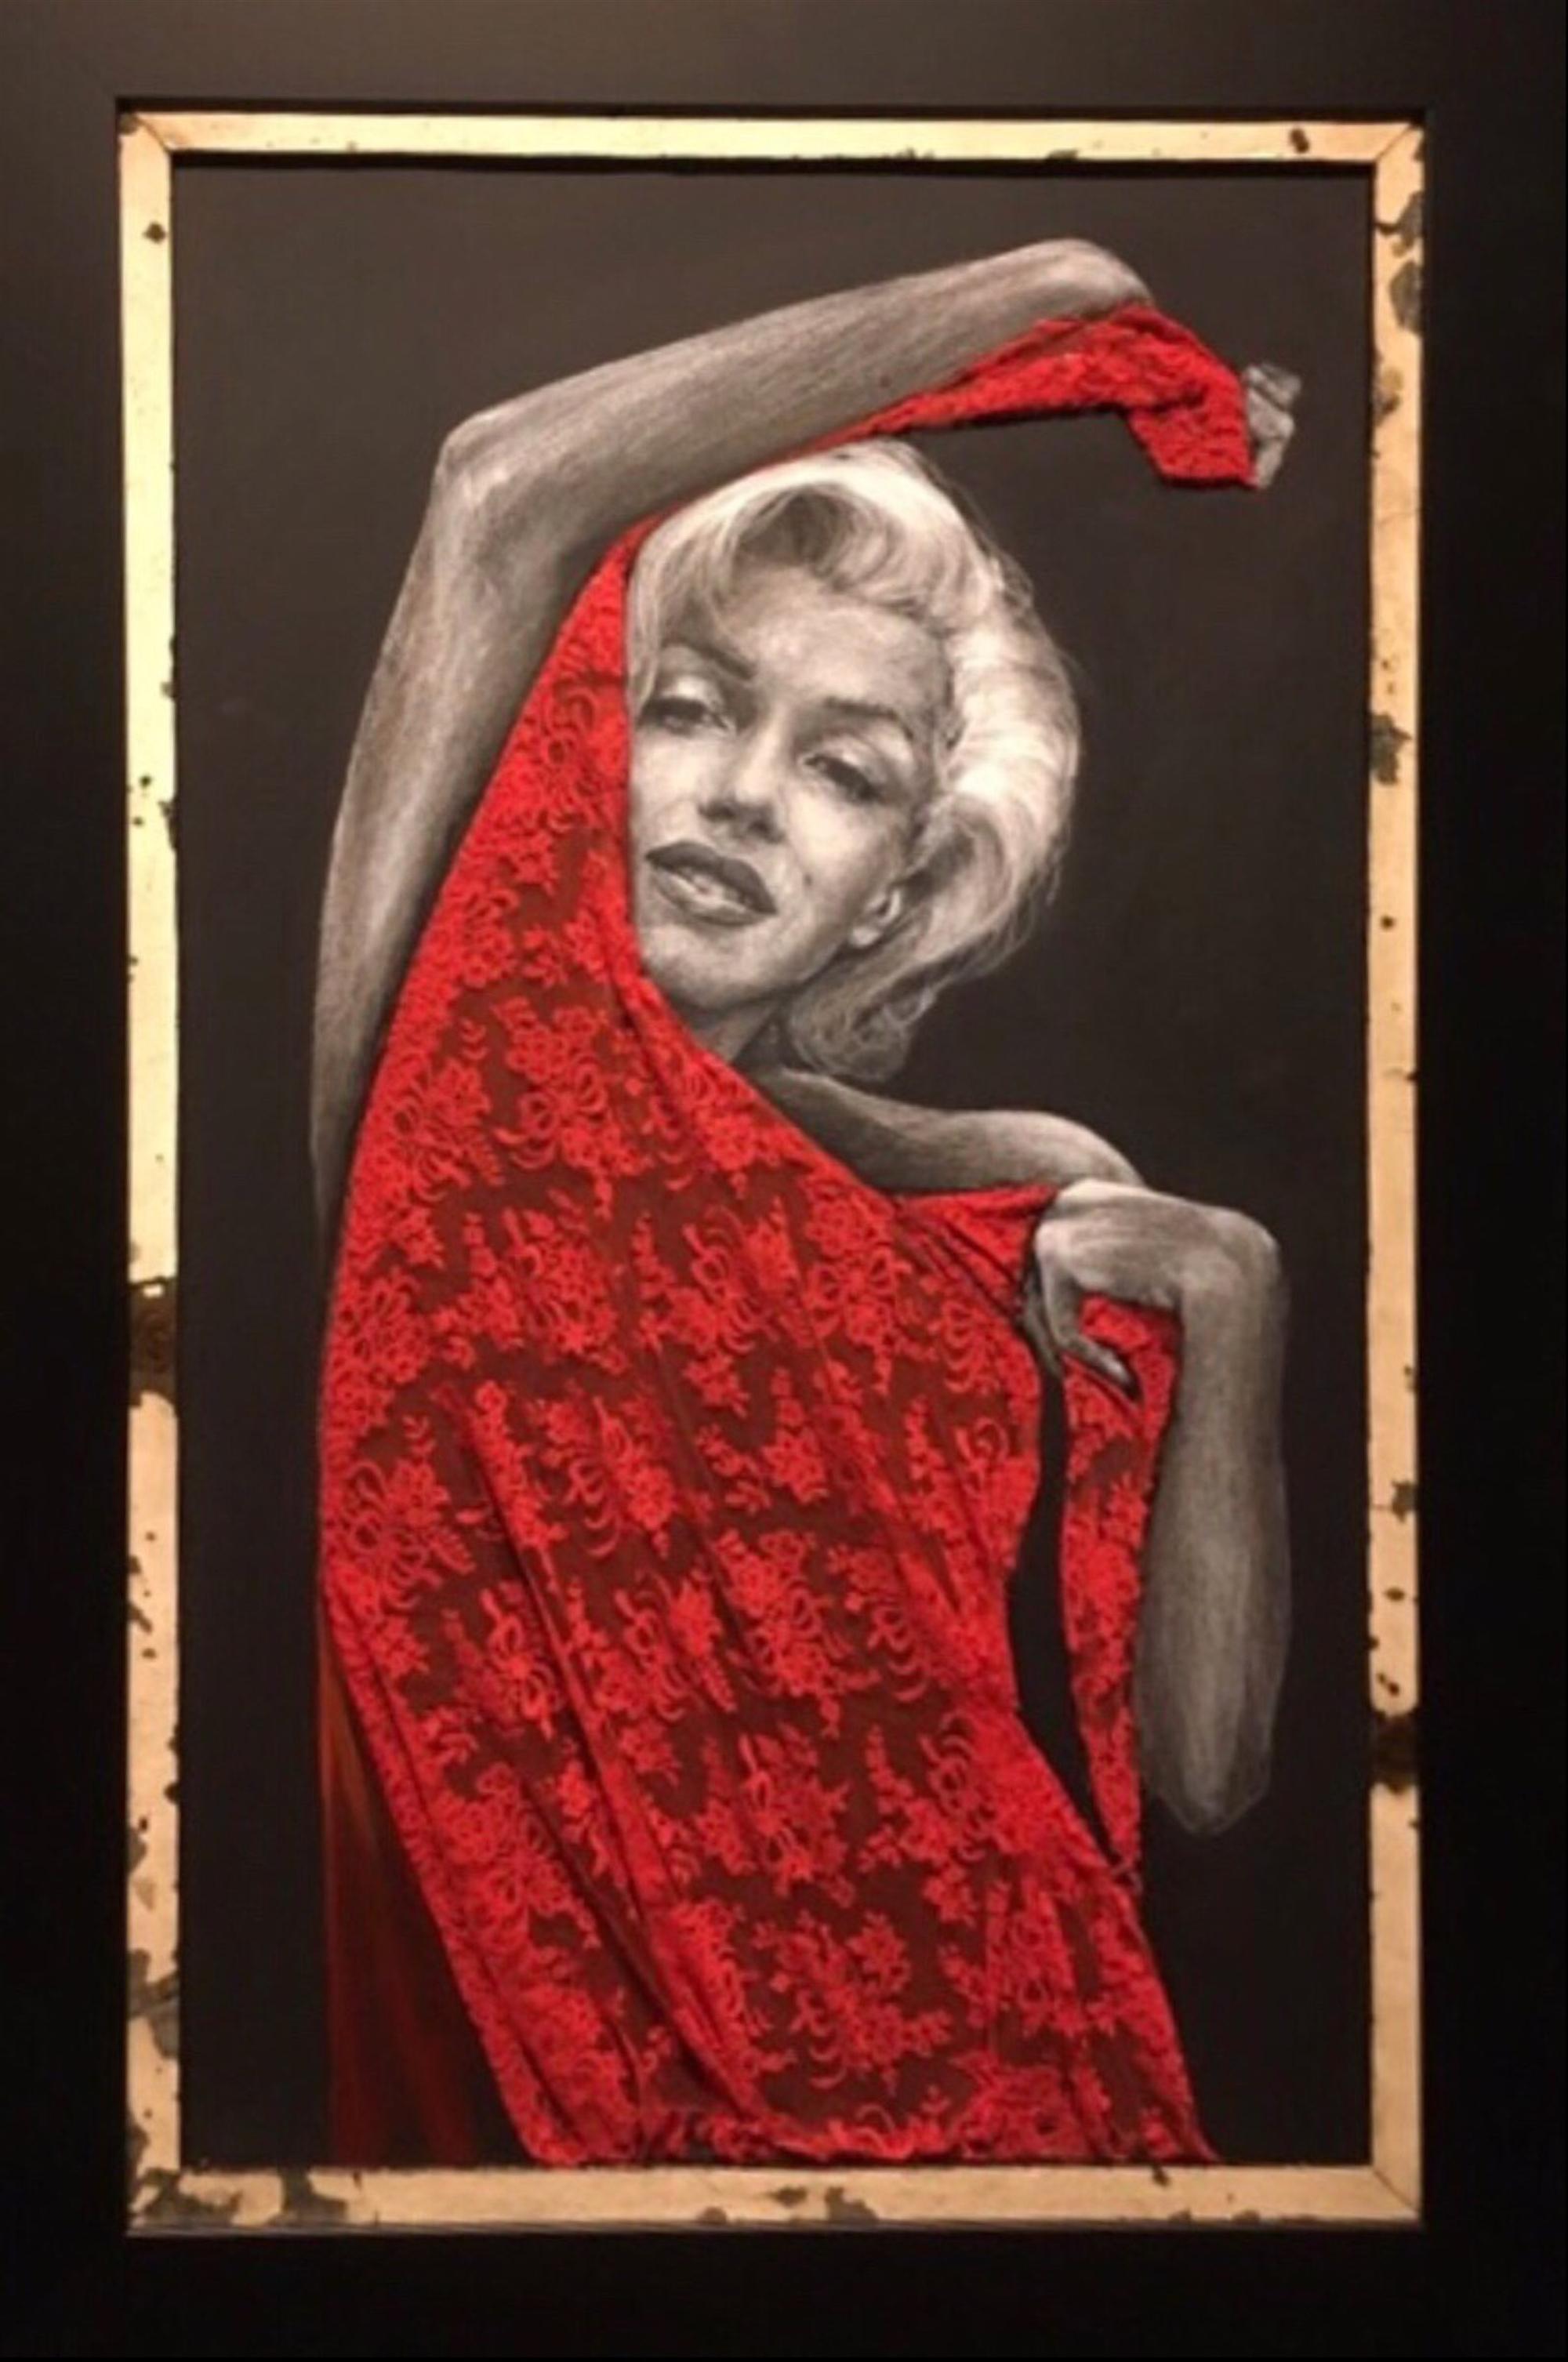 Marilyn by Bill Mack